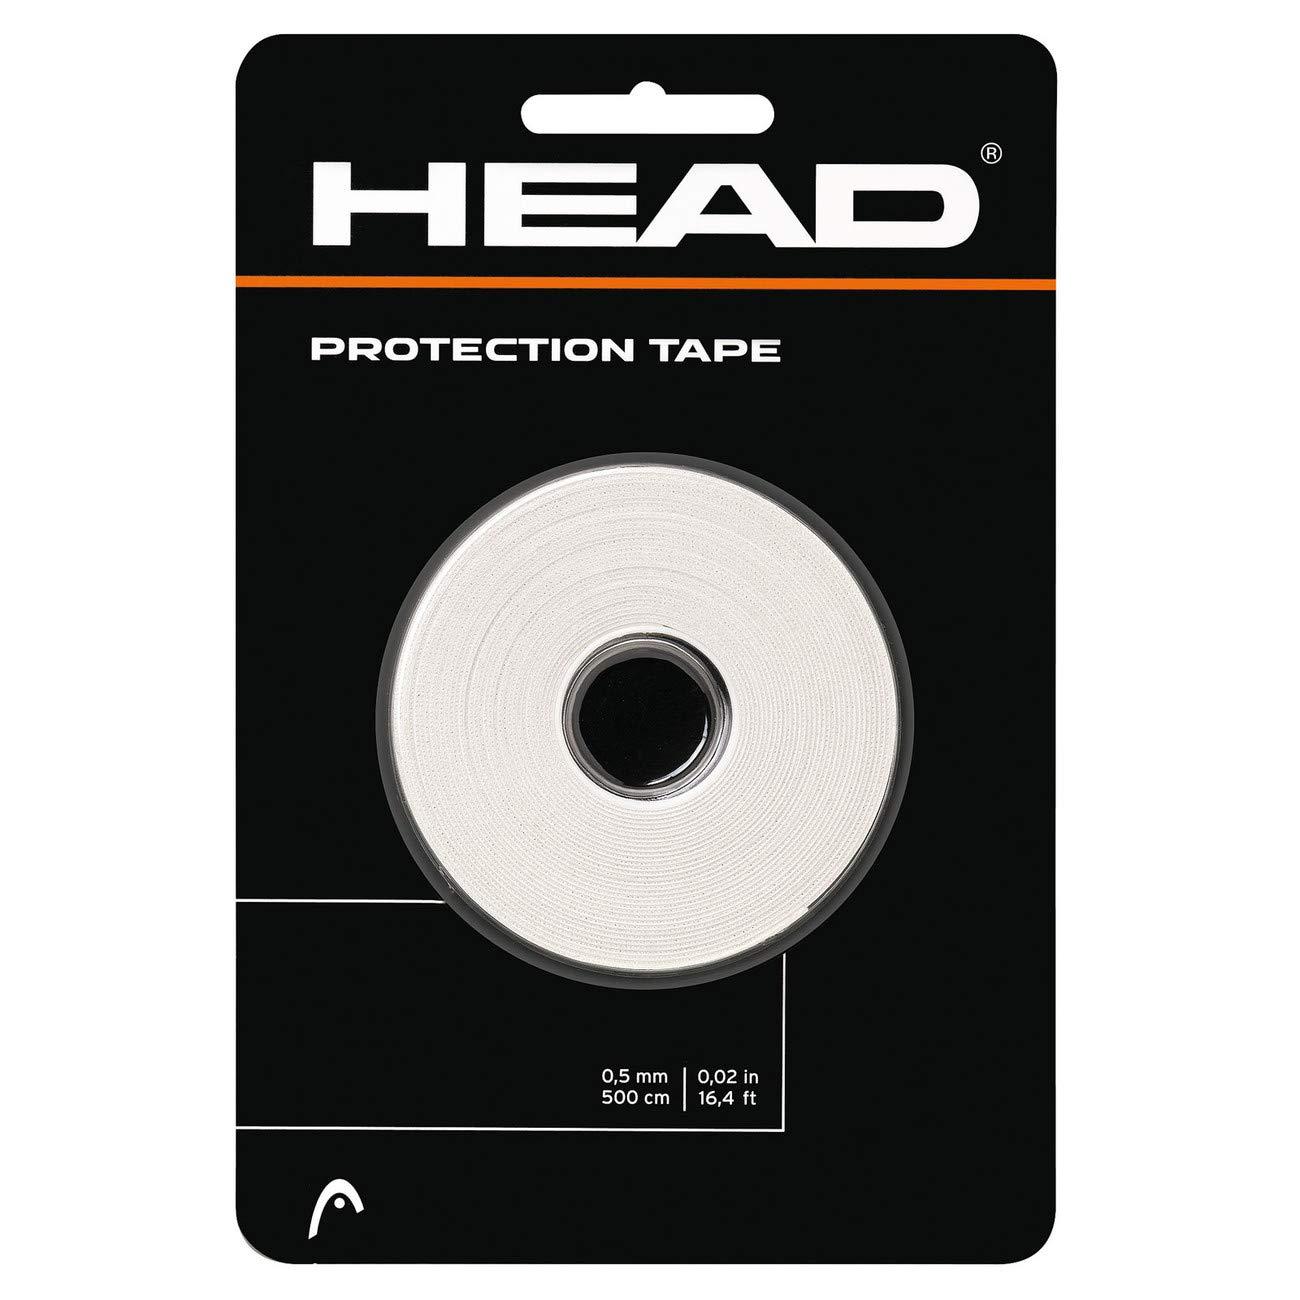 Head New Protection Tape - Cinta Protectora, Color Blanco: Amazon ...